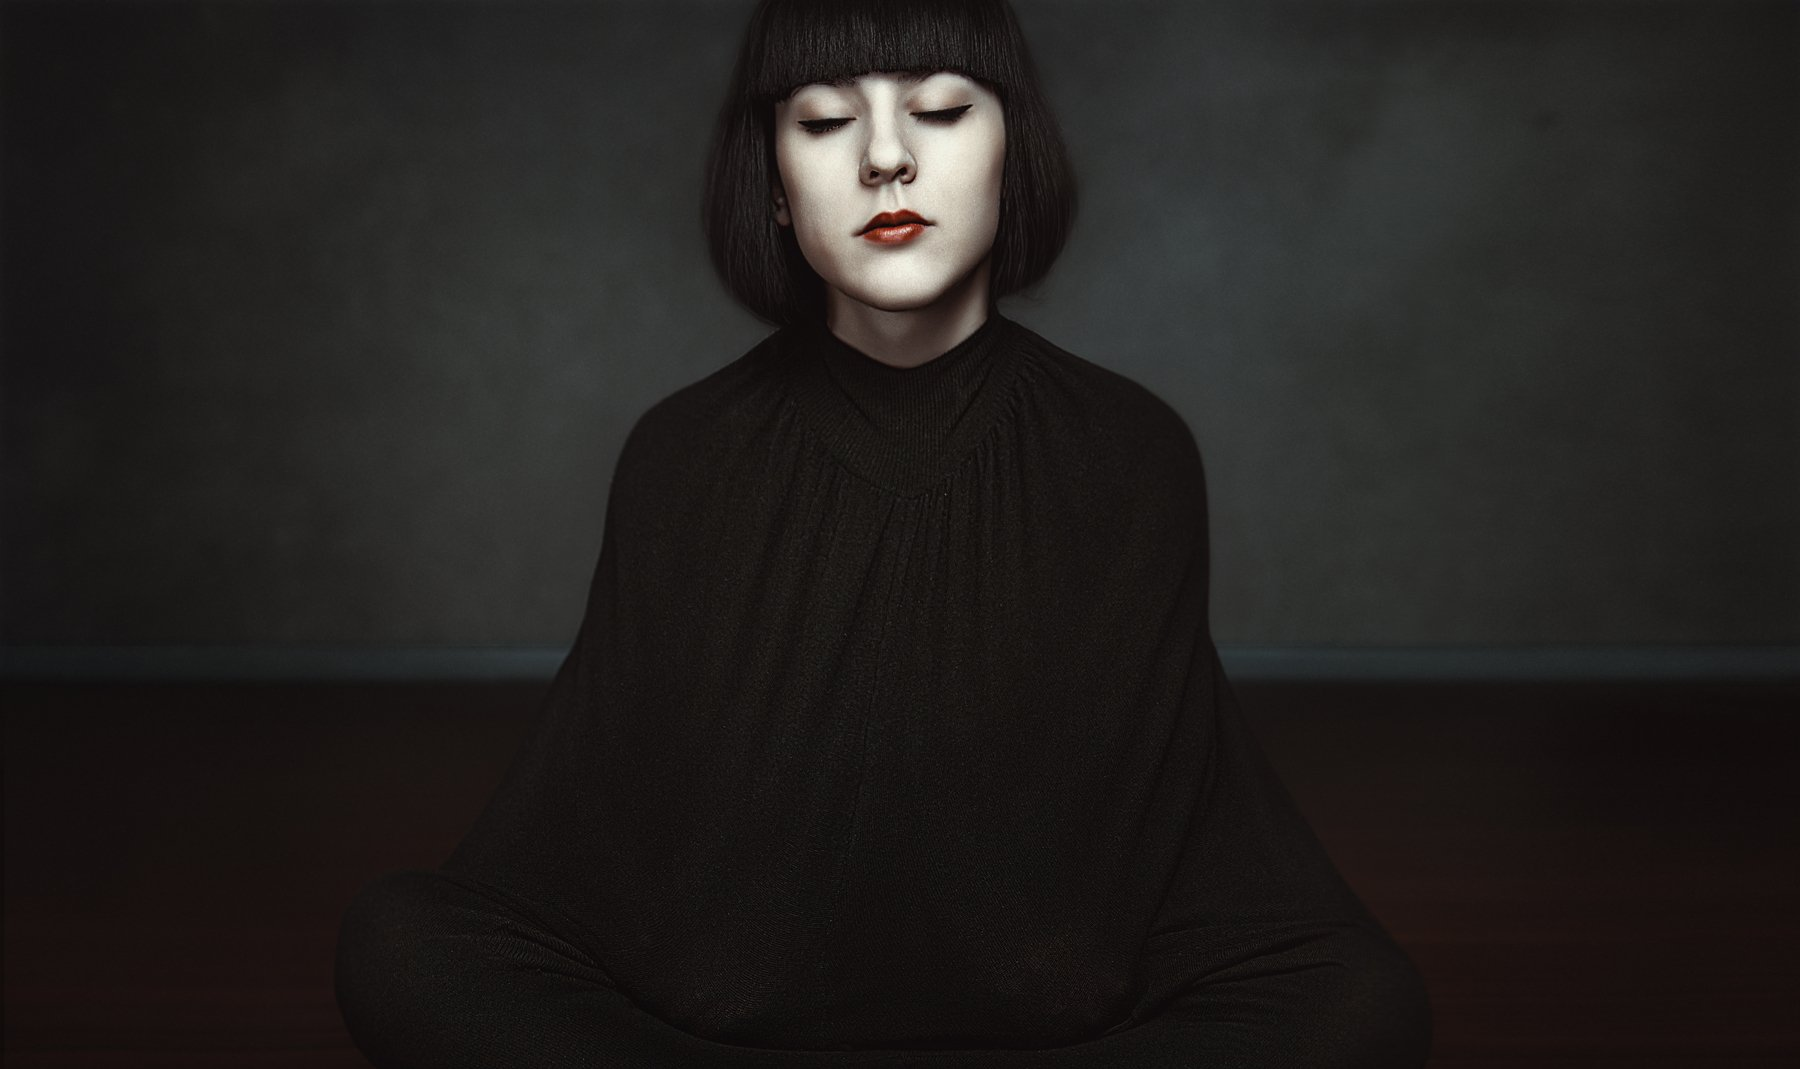 fashion fashion style studio portrait, Маховицкая Кристина